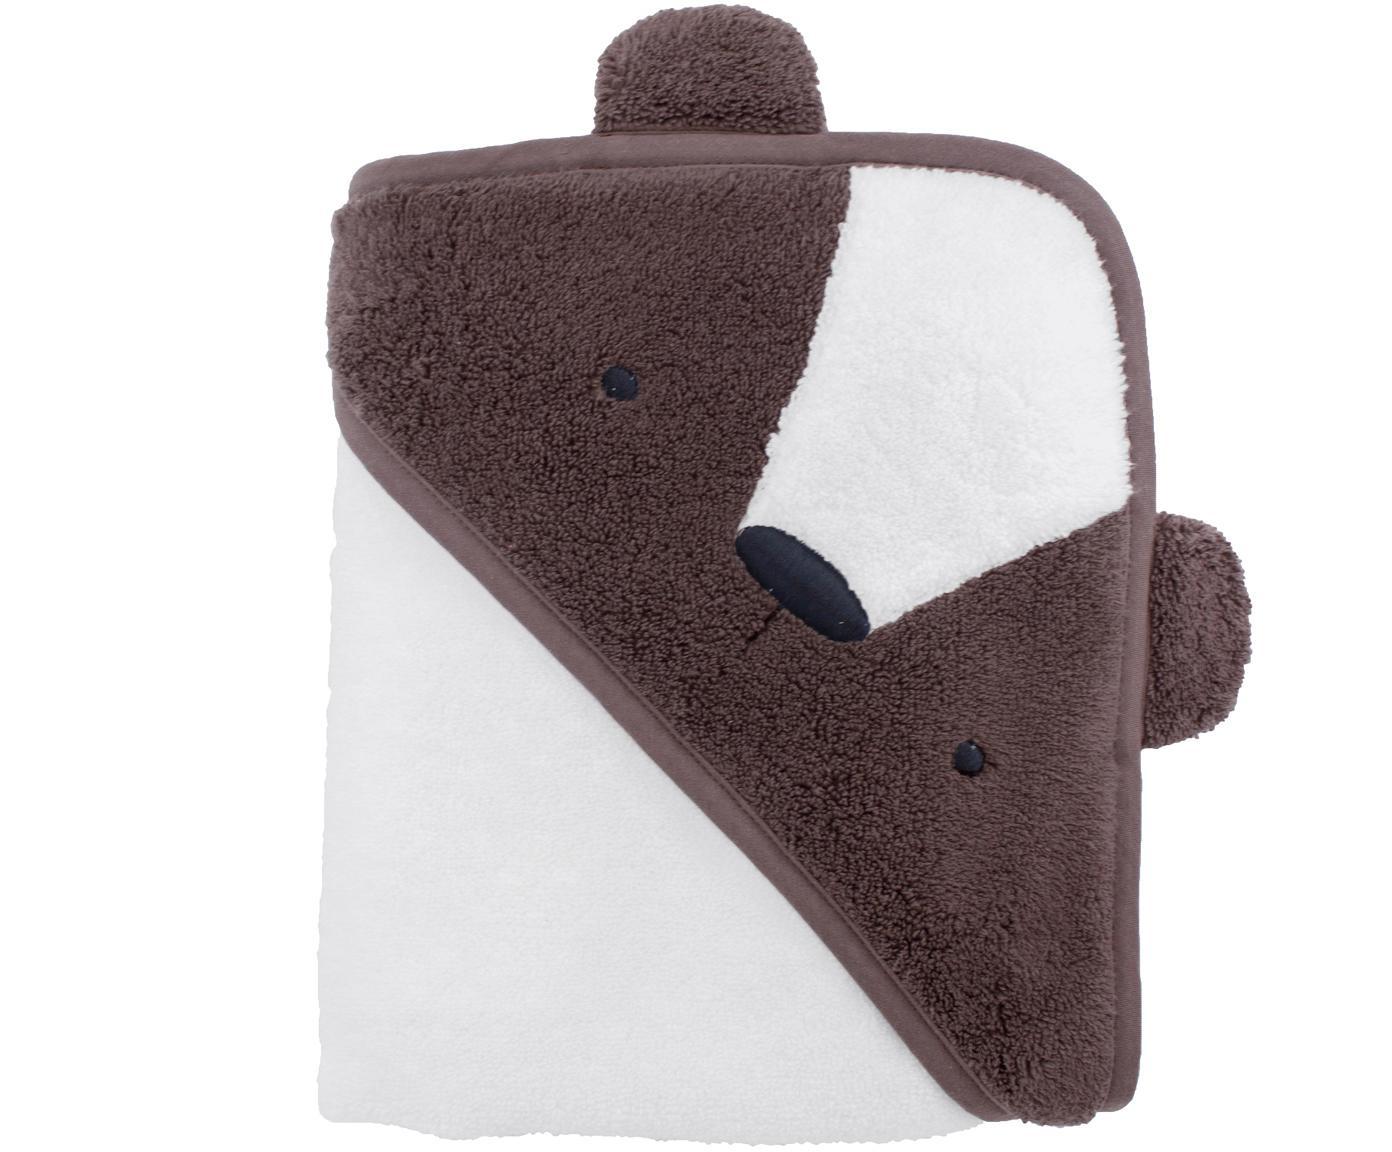 Toalla capa Bär, Algodón, certificado GOTS, Marrón, blanco, An 85 x L 85 cm